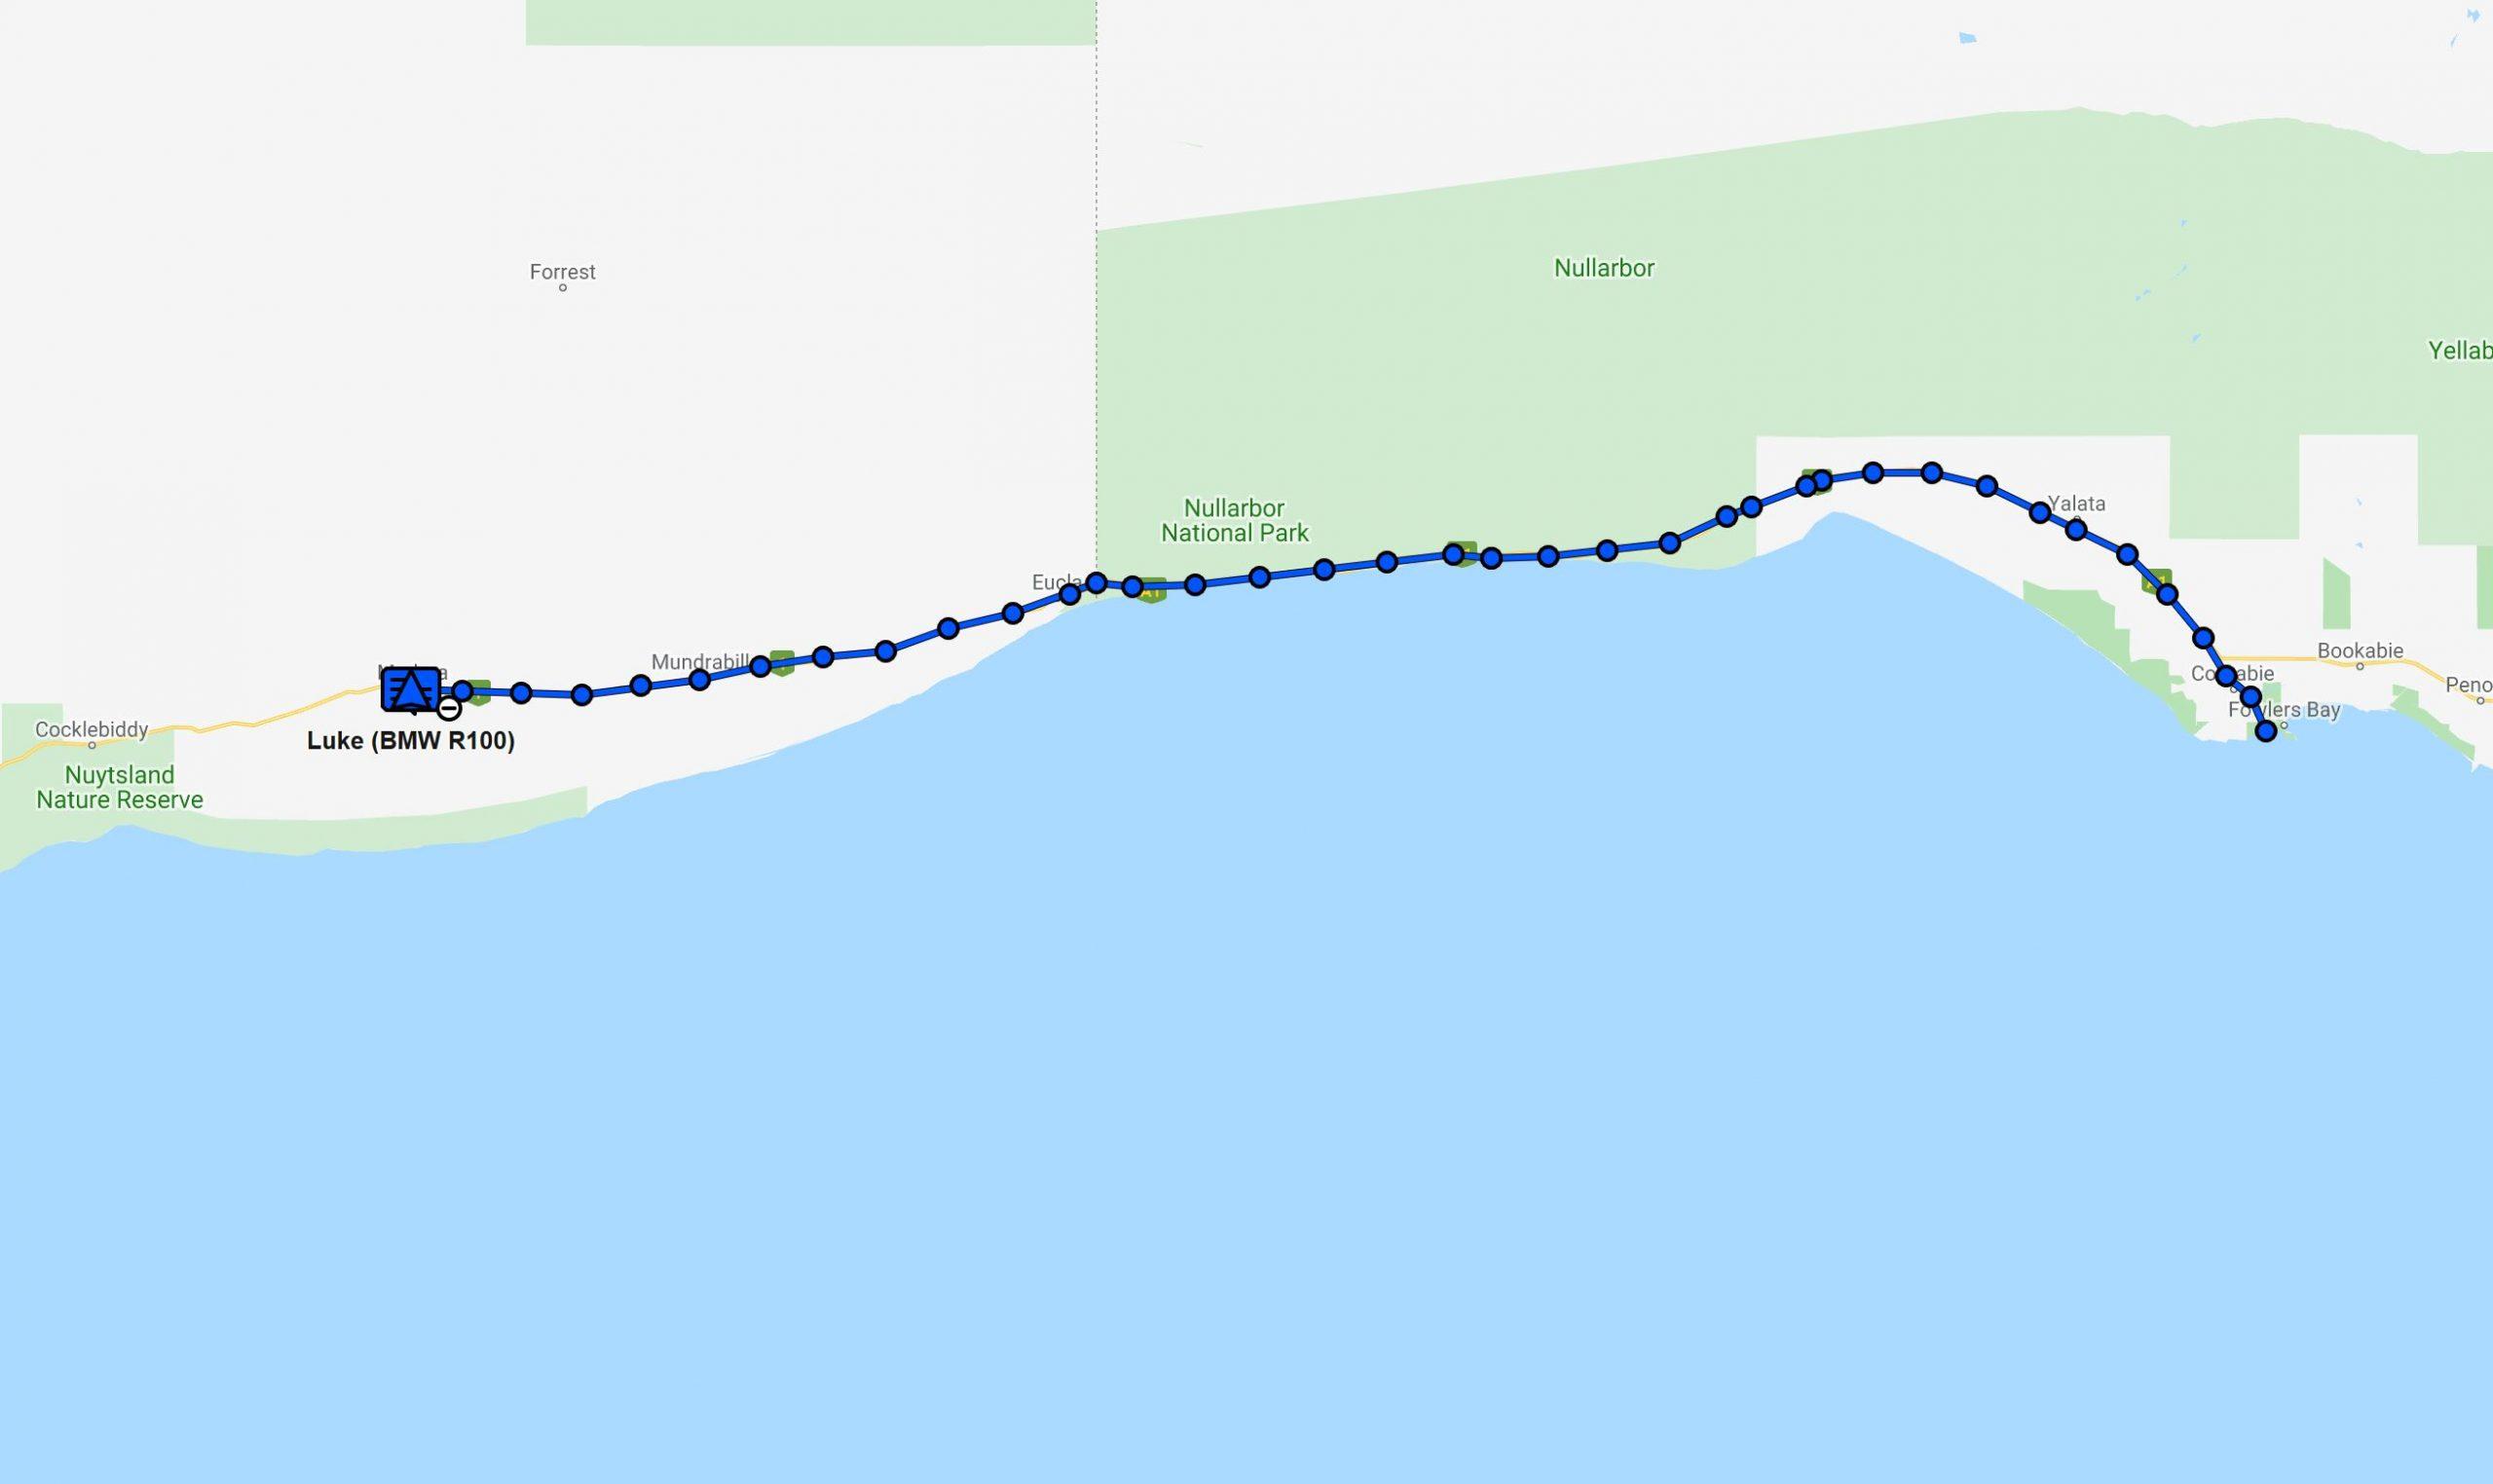 Perth Trip – Day 21 – 2019/12/22